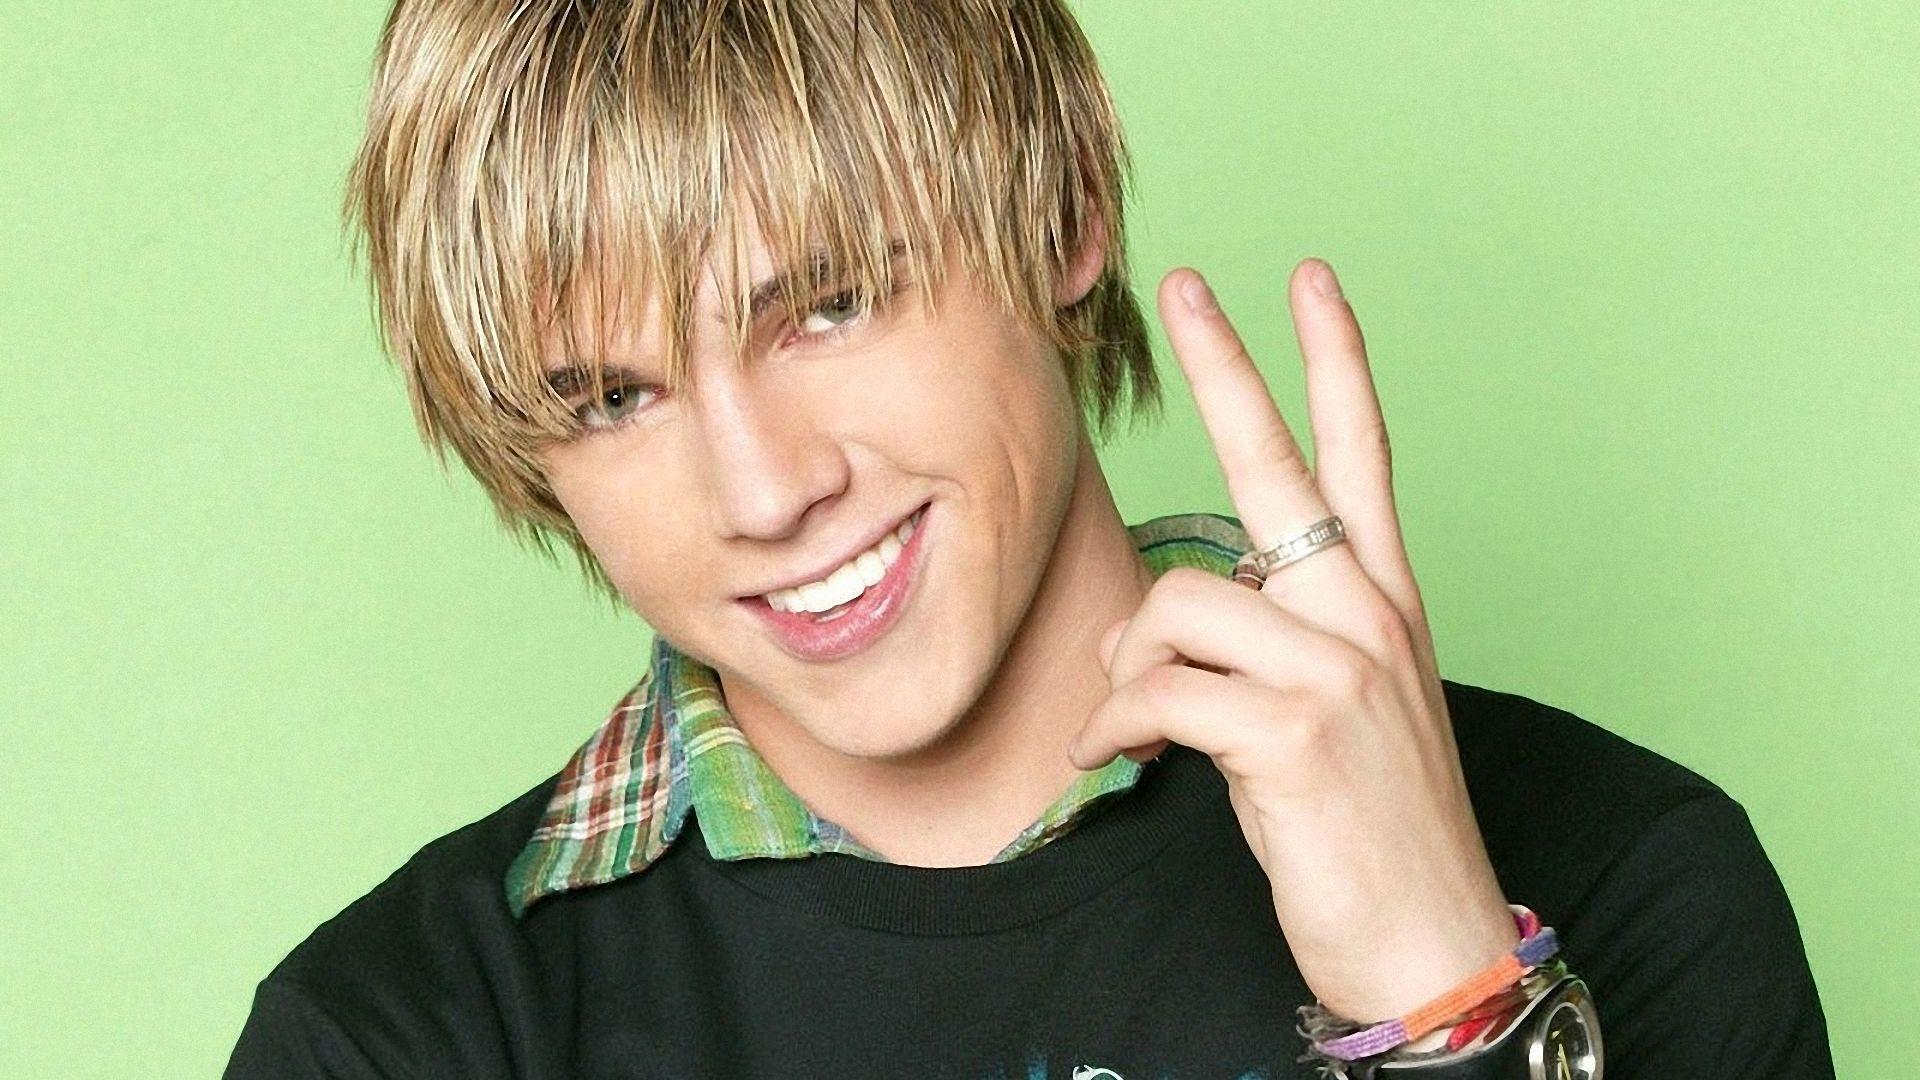 Красивая картинка мальчика блондина